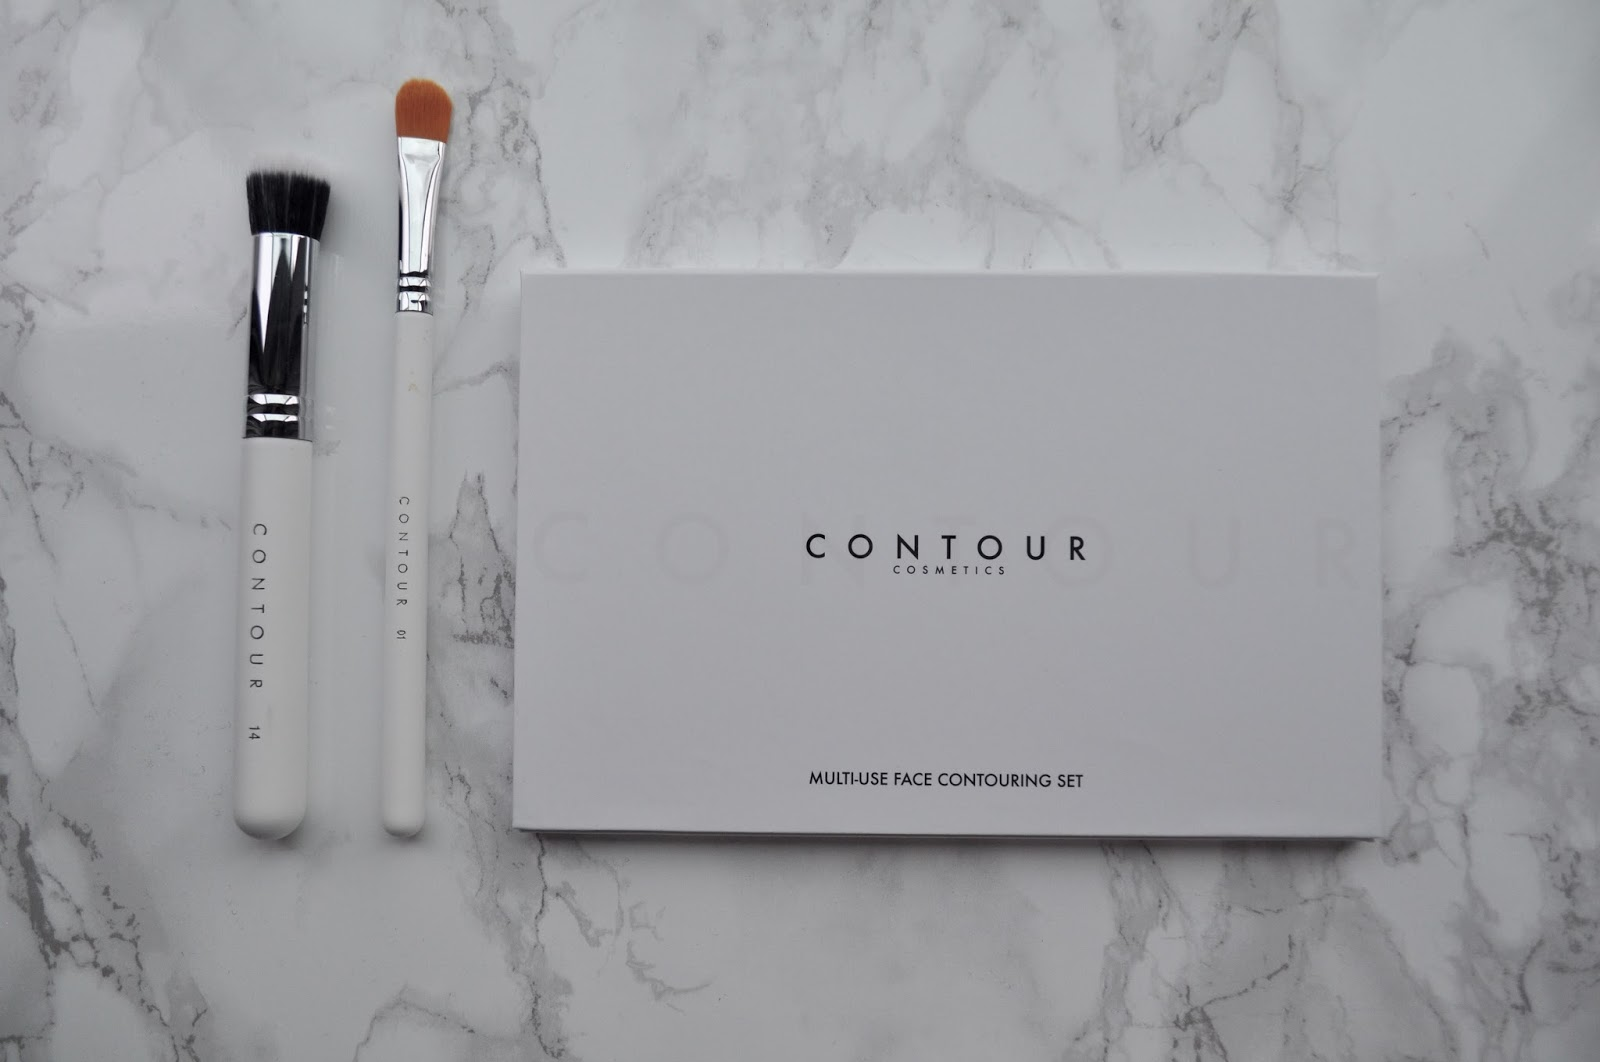 Contour cosmetics cream makeup palette white brushes bronzer concealer highlight